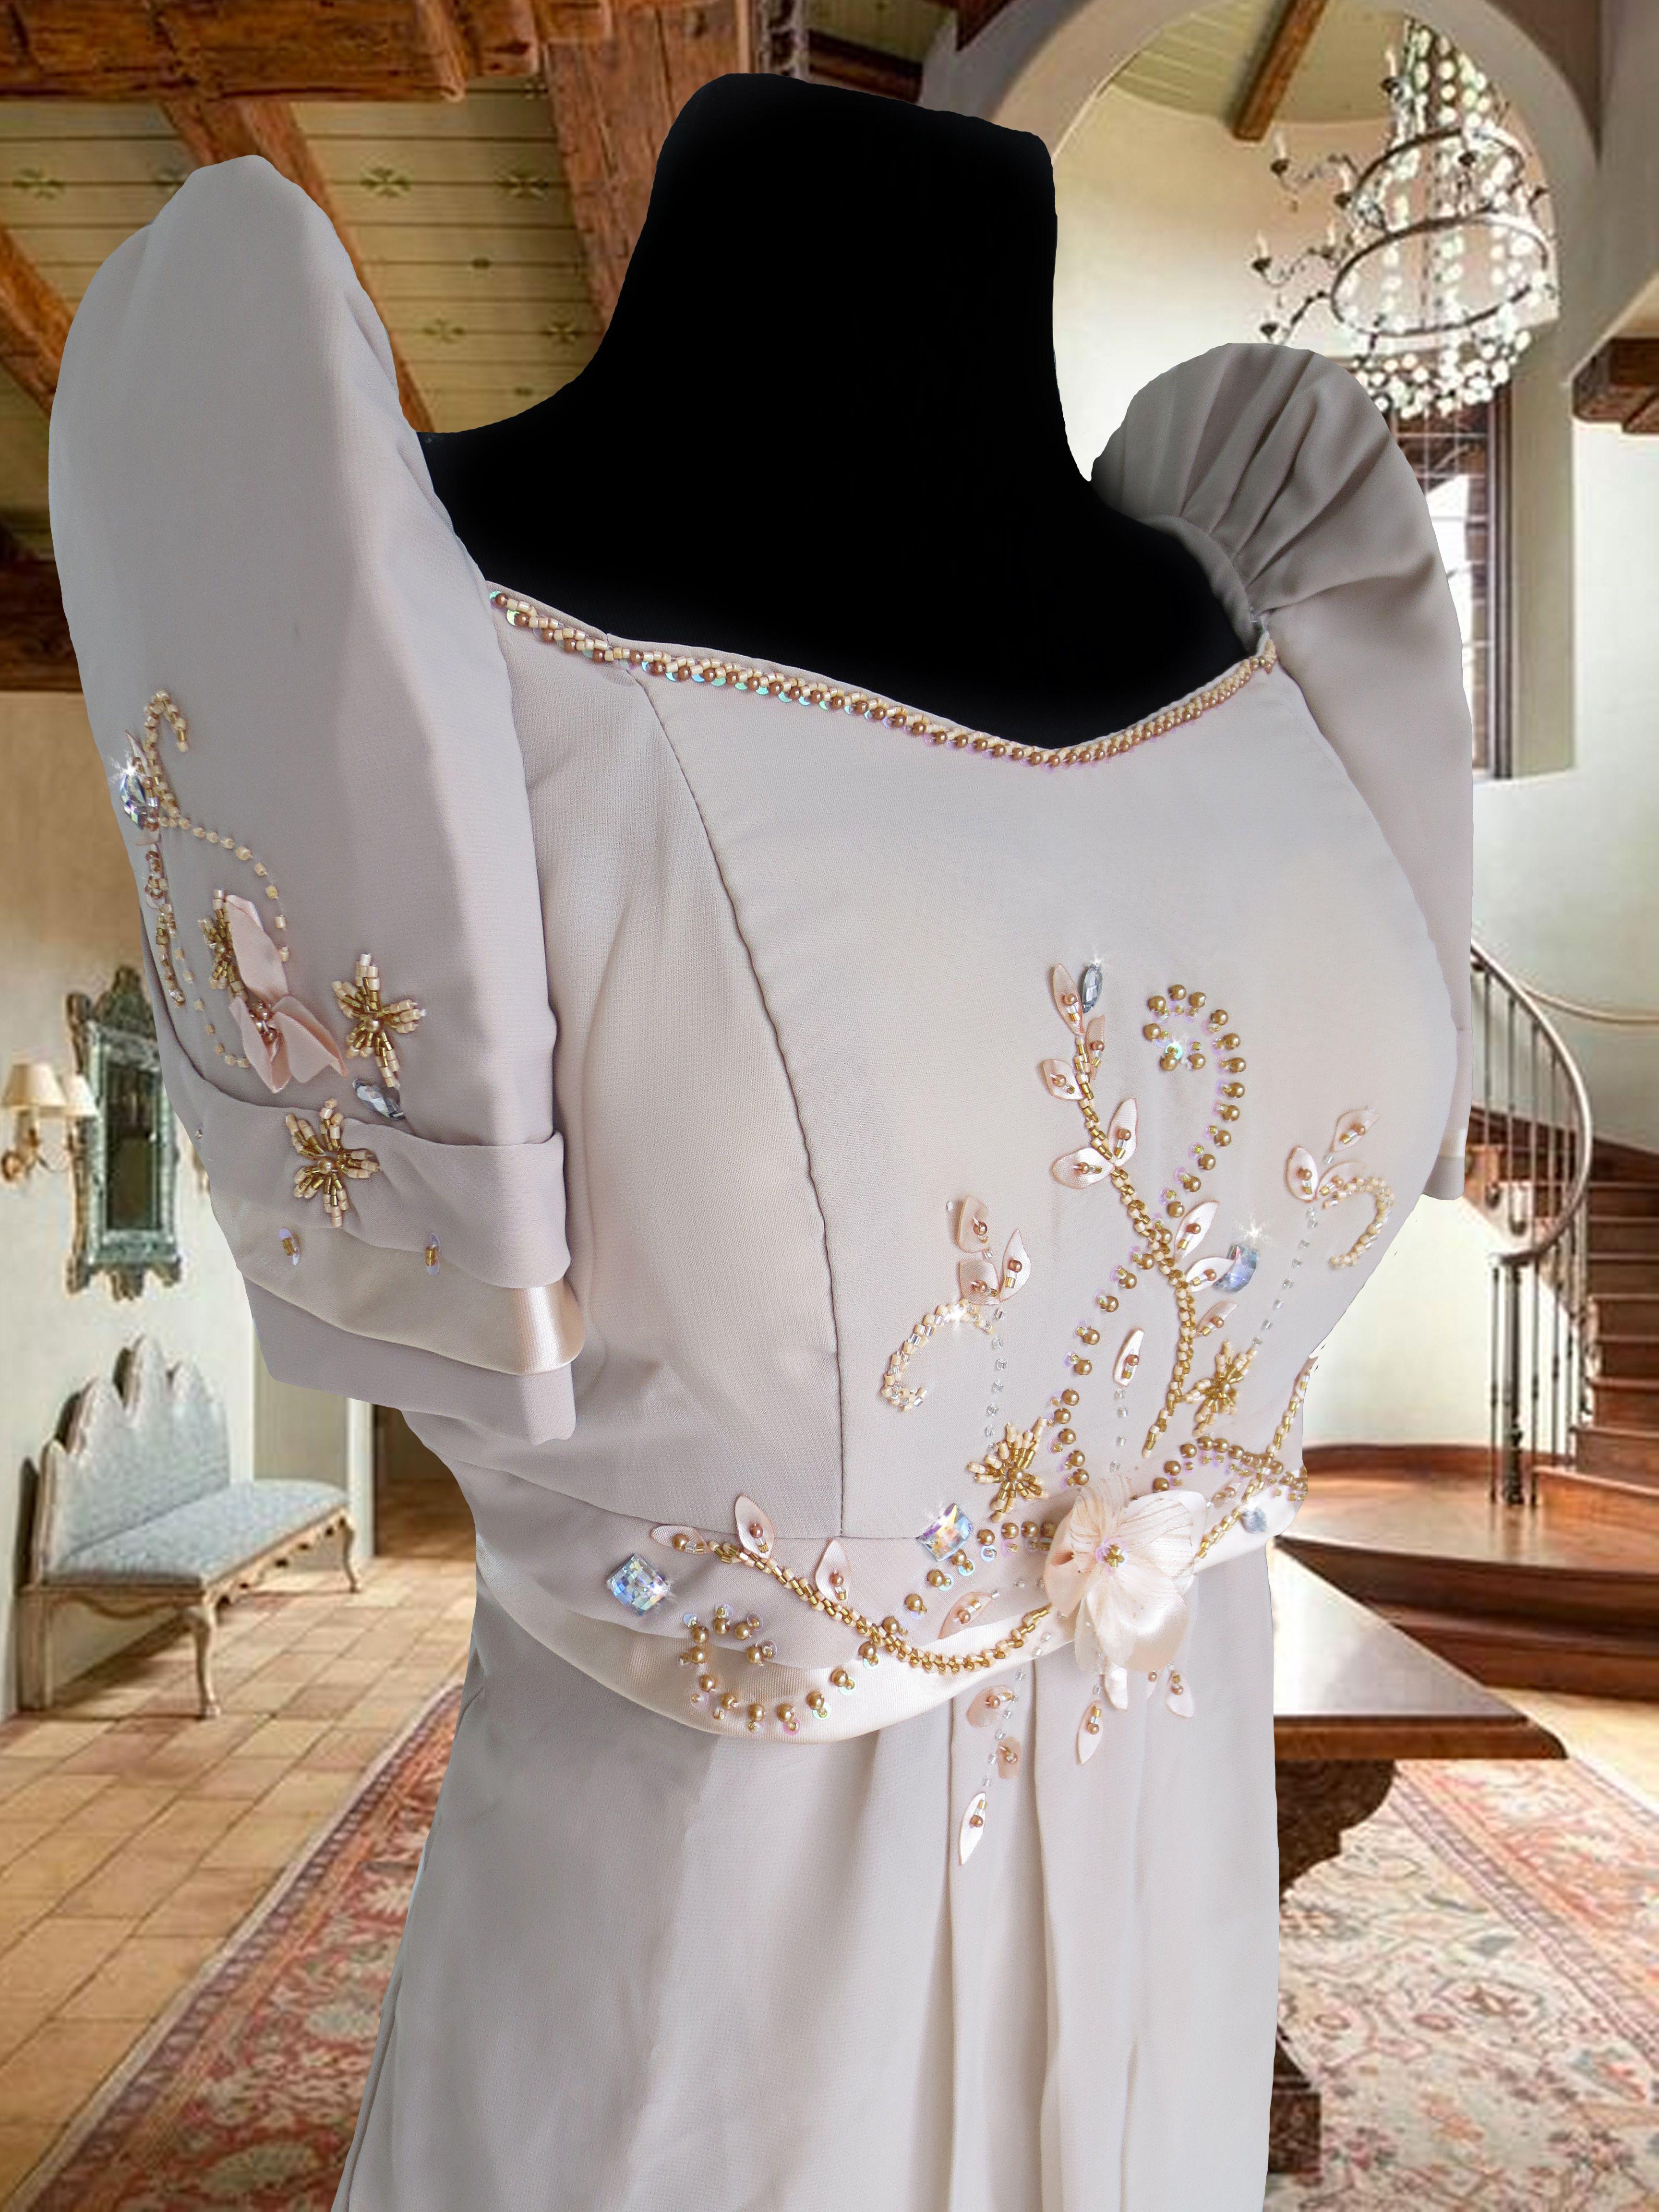 Filipiniana Filipiñana long gown Php1,500 rental www.gownforent.com ...